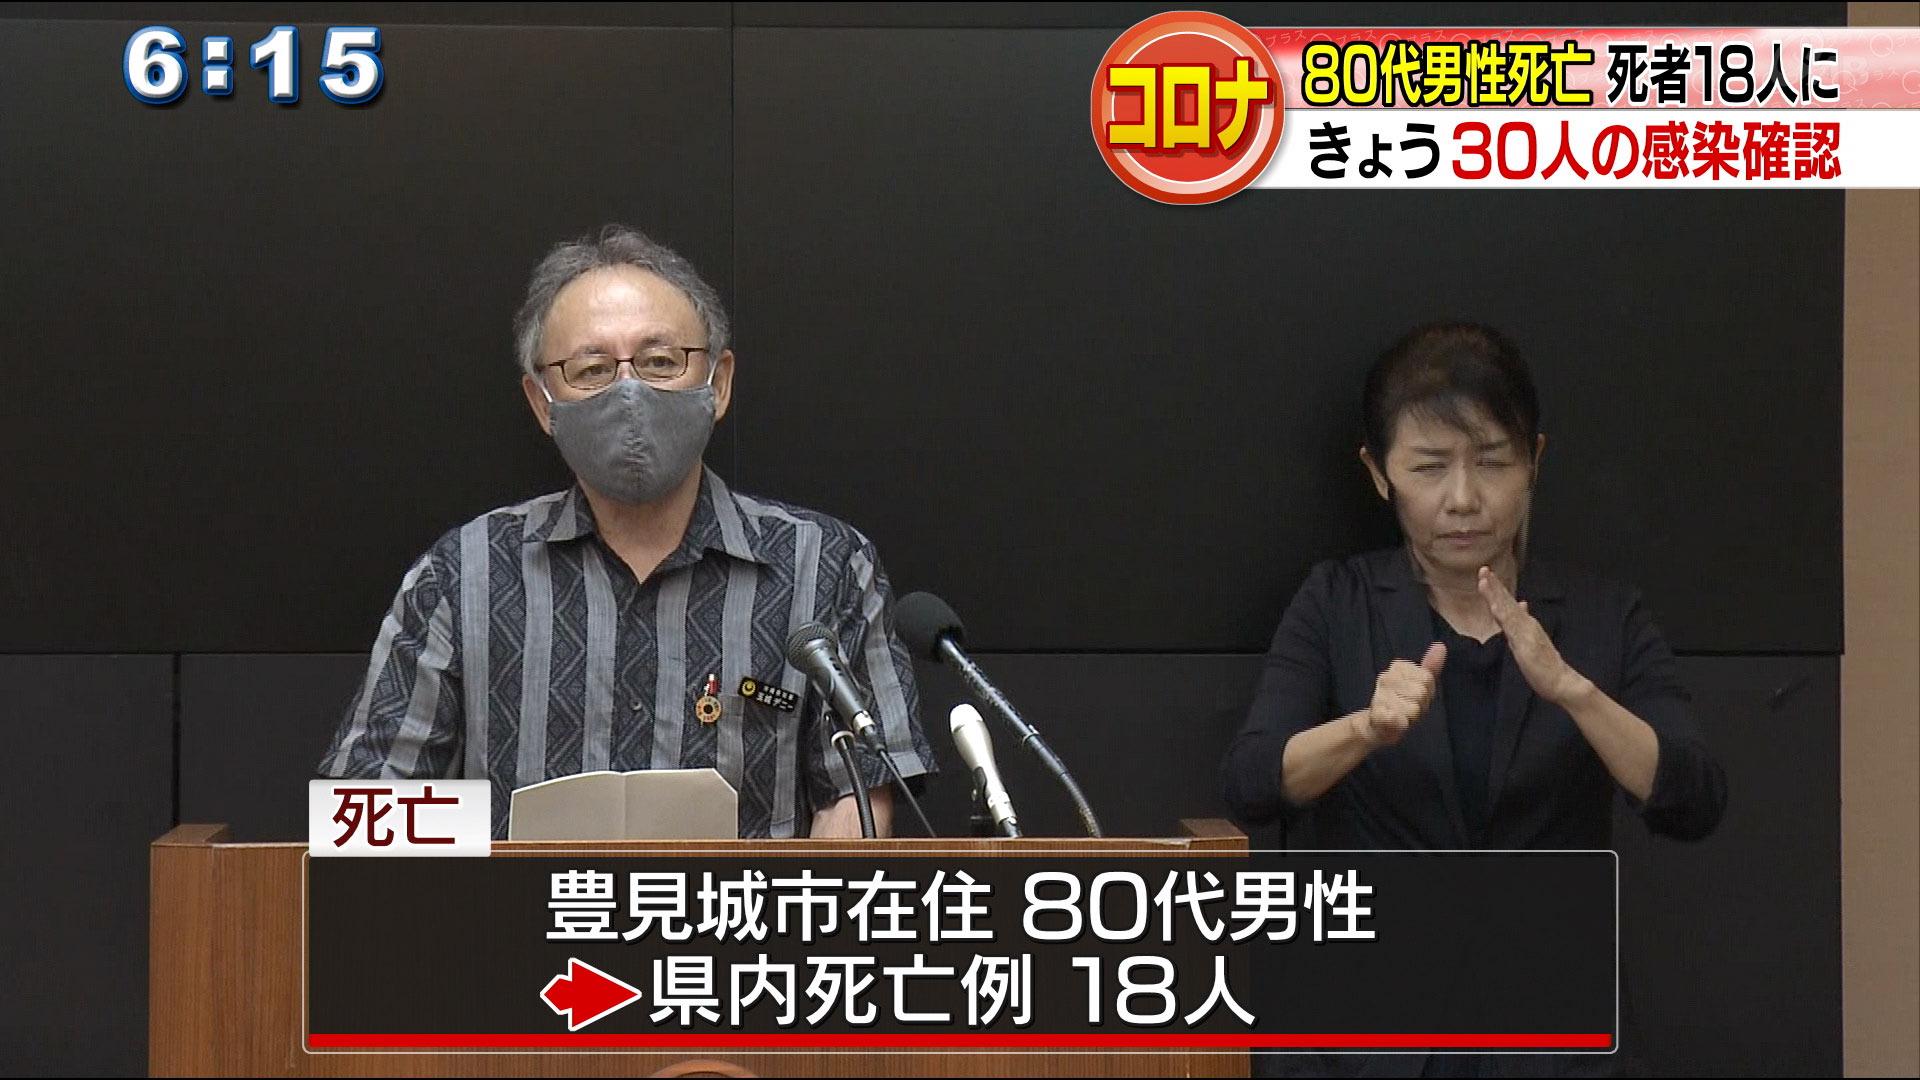 新型コロナ80代男性1人死亡 30人感染確認